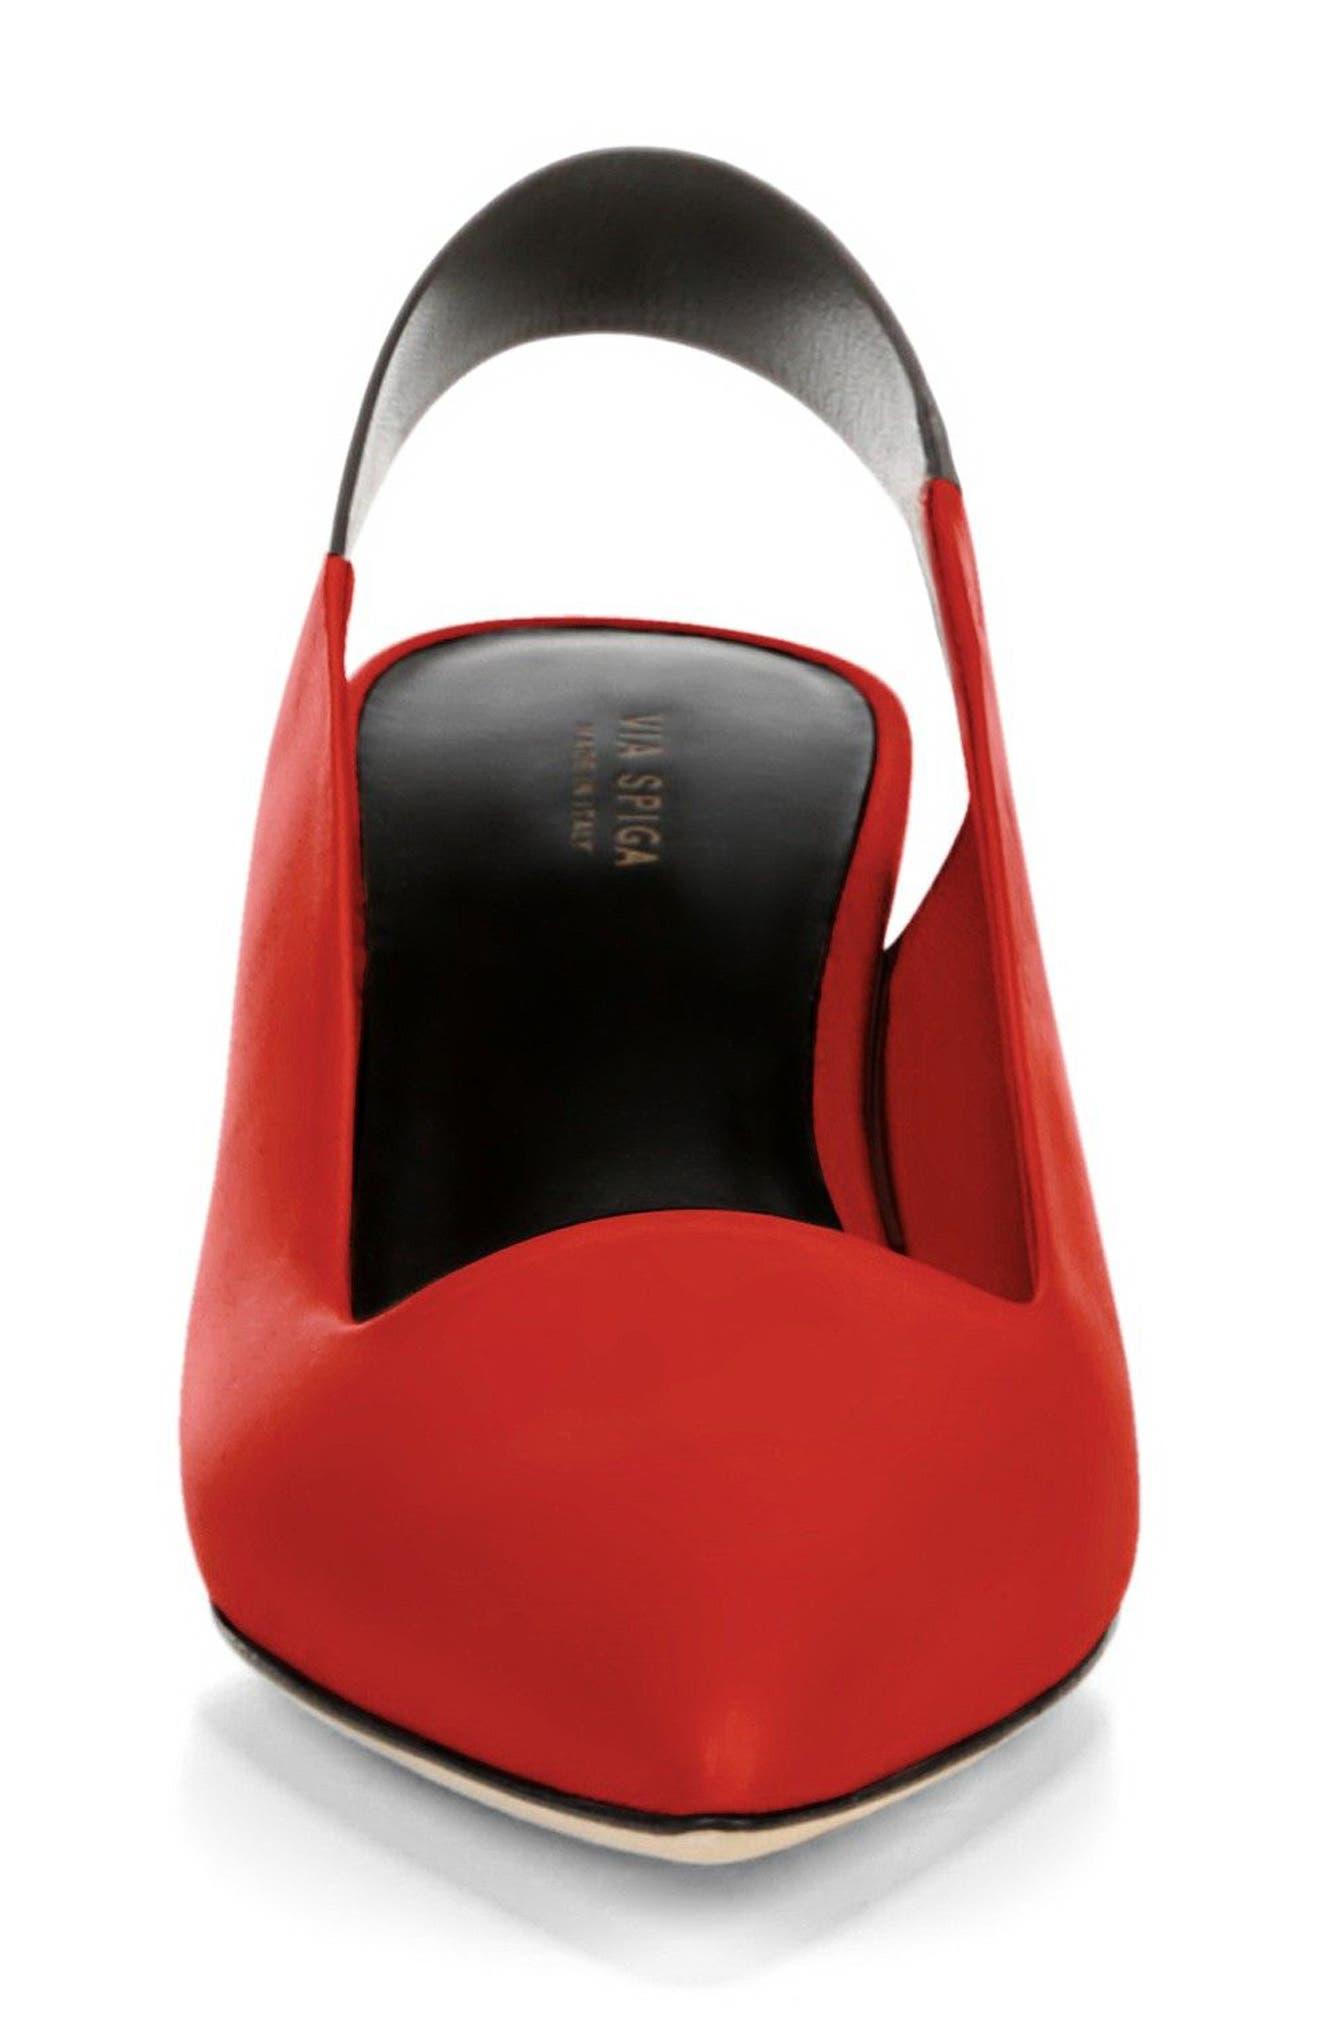 Blake Slingback Pump,                             Alternate thumbnail 3, color,                             Poppy Red/ Black Leather